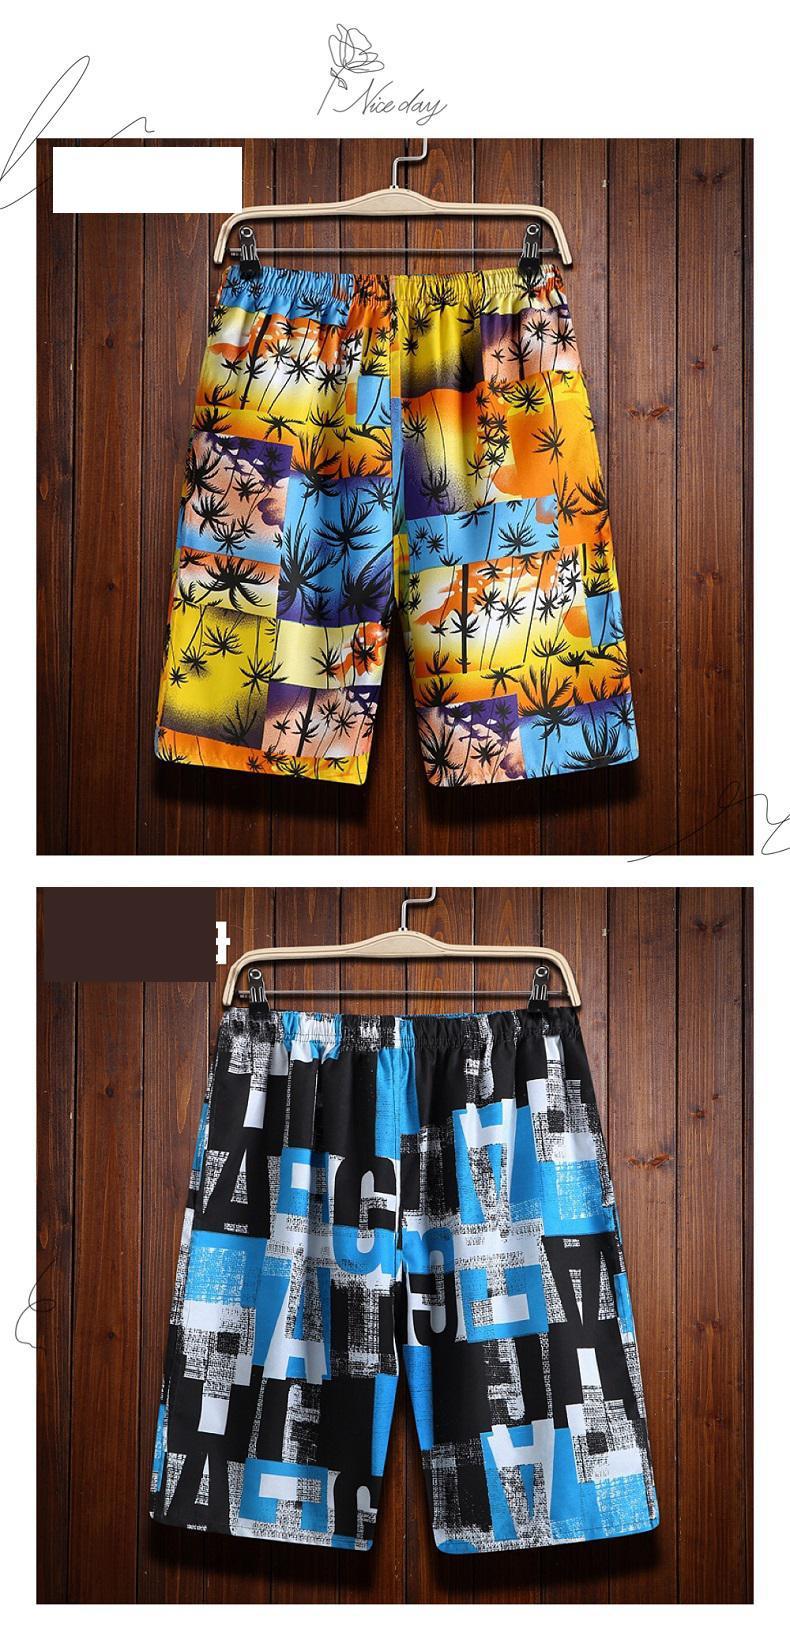 10 Patterns Camouflage Compression Shorts Men Summer Clothing Board Shorts Nylon Bottom Men Side Pockets Men's Swimwear 2